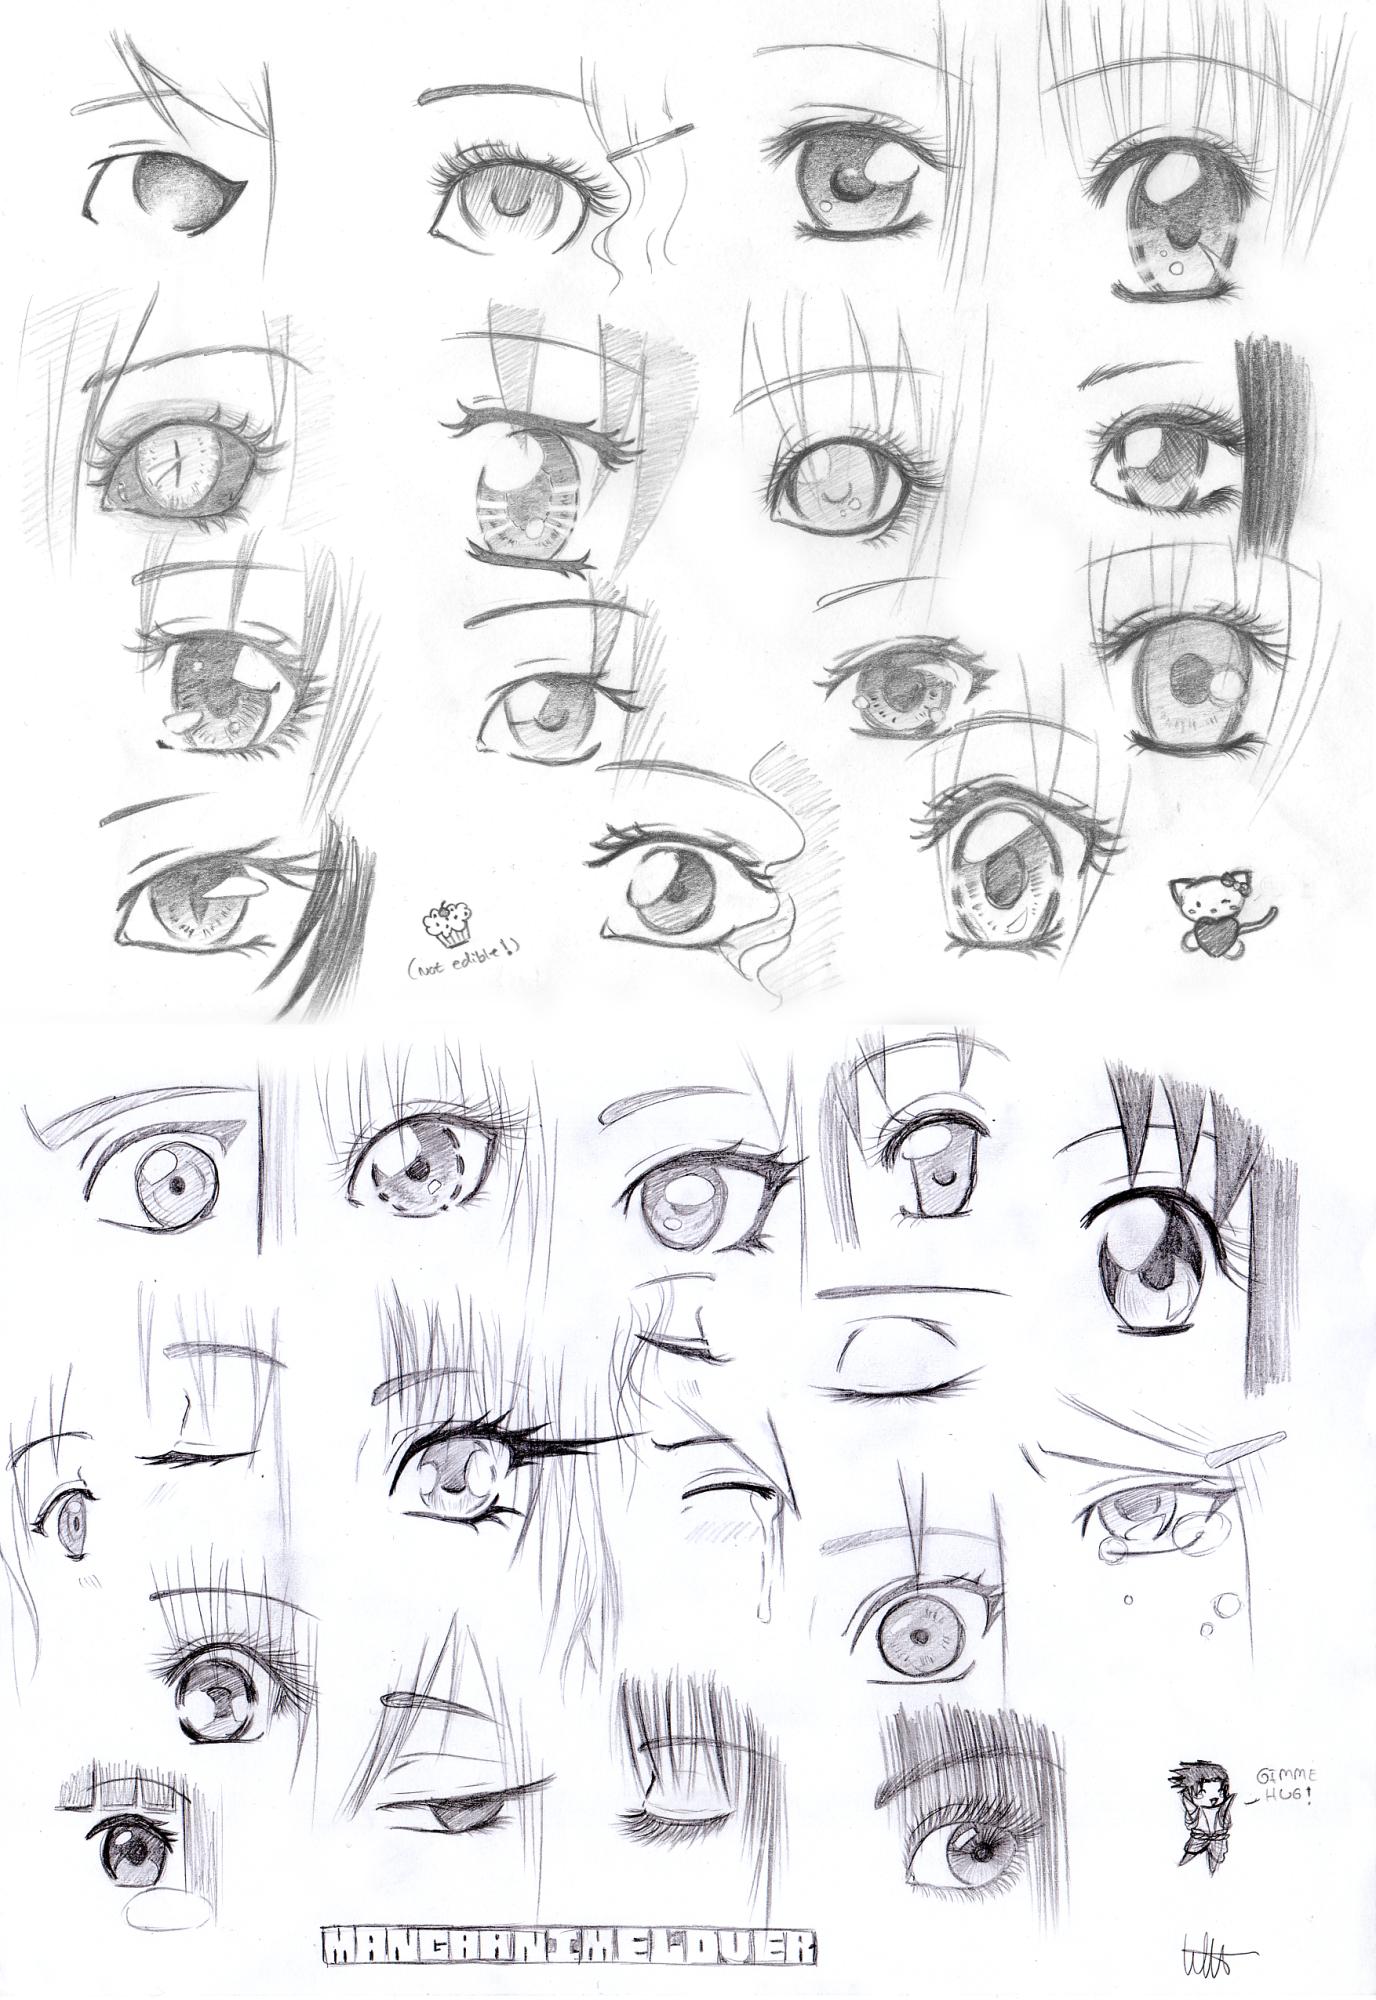 More manga eyes by MangaAnimeLover on DeviantArt